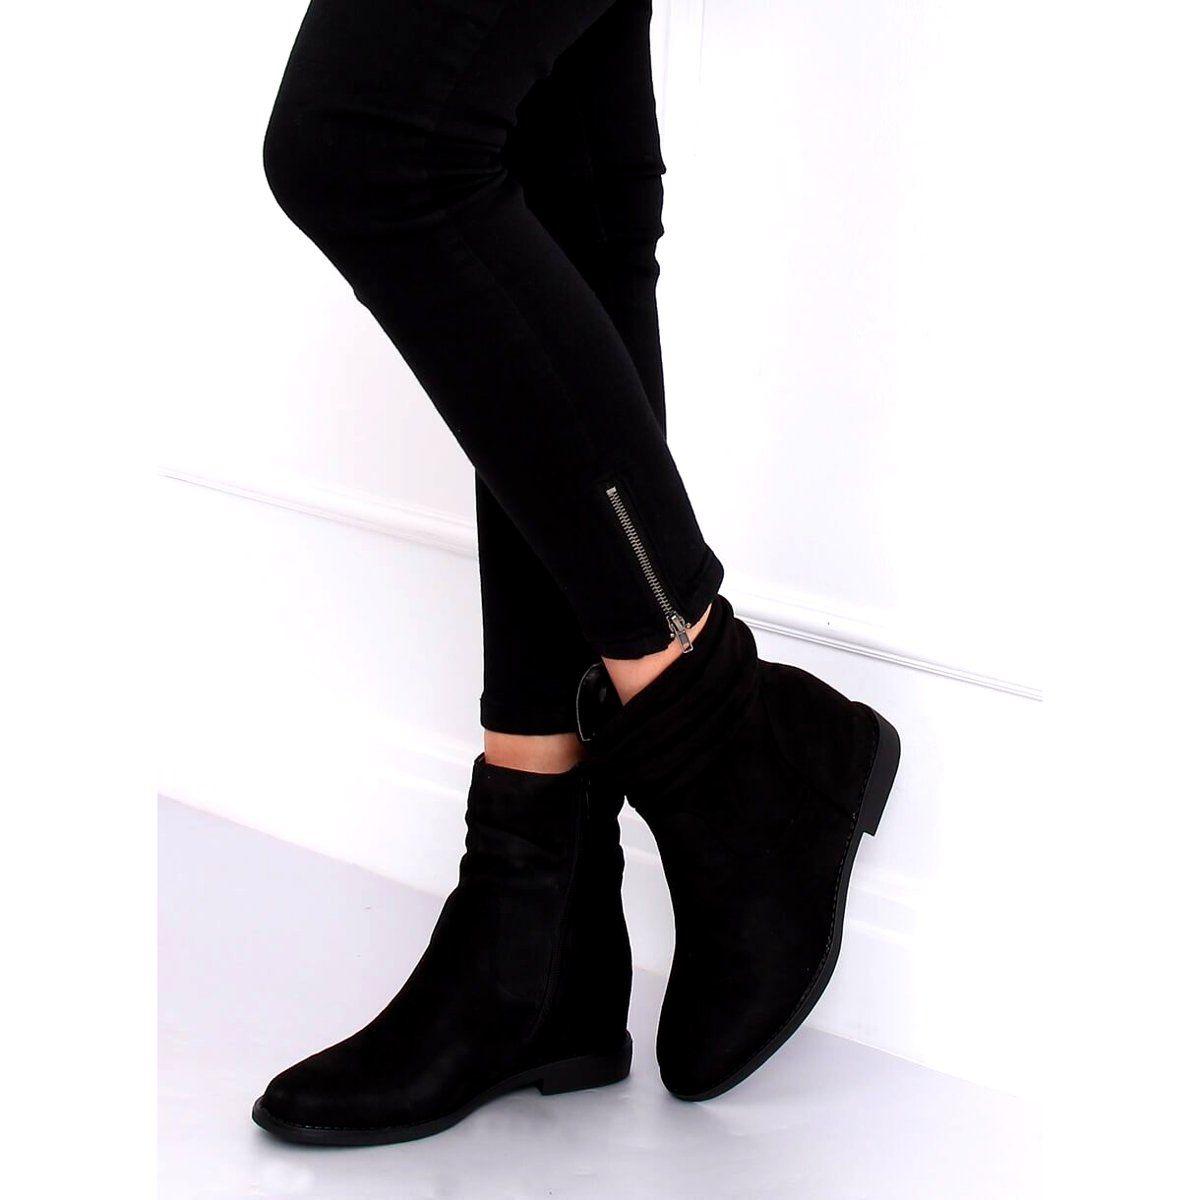 Botki Na Ukrytym Koturnie Czarne 2c8ax7680 1 Black Fashion Wedge Boot Shoes